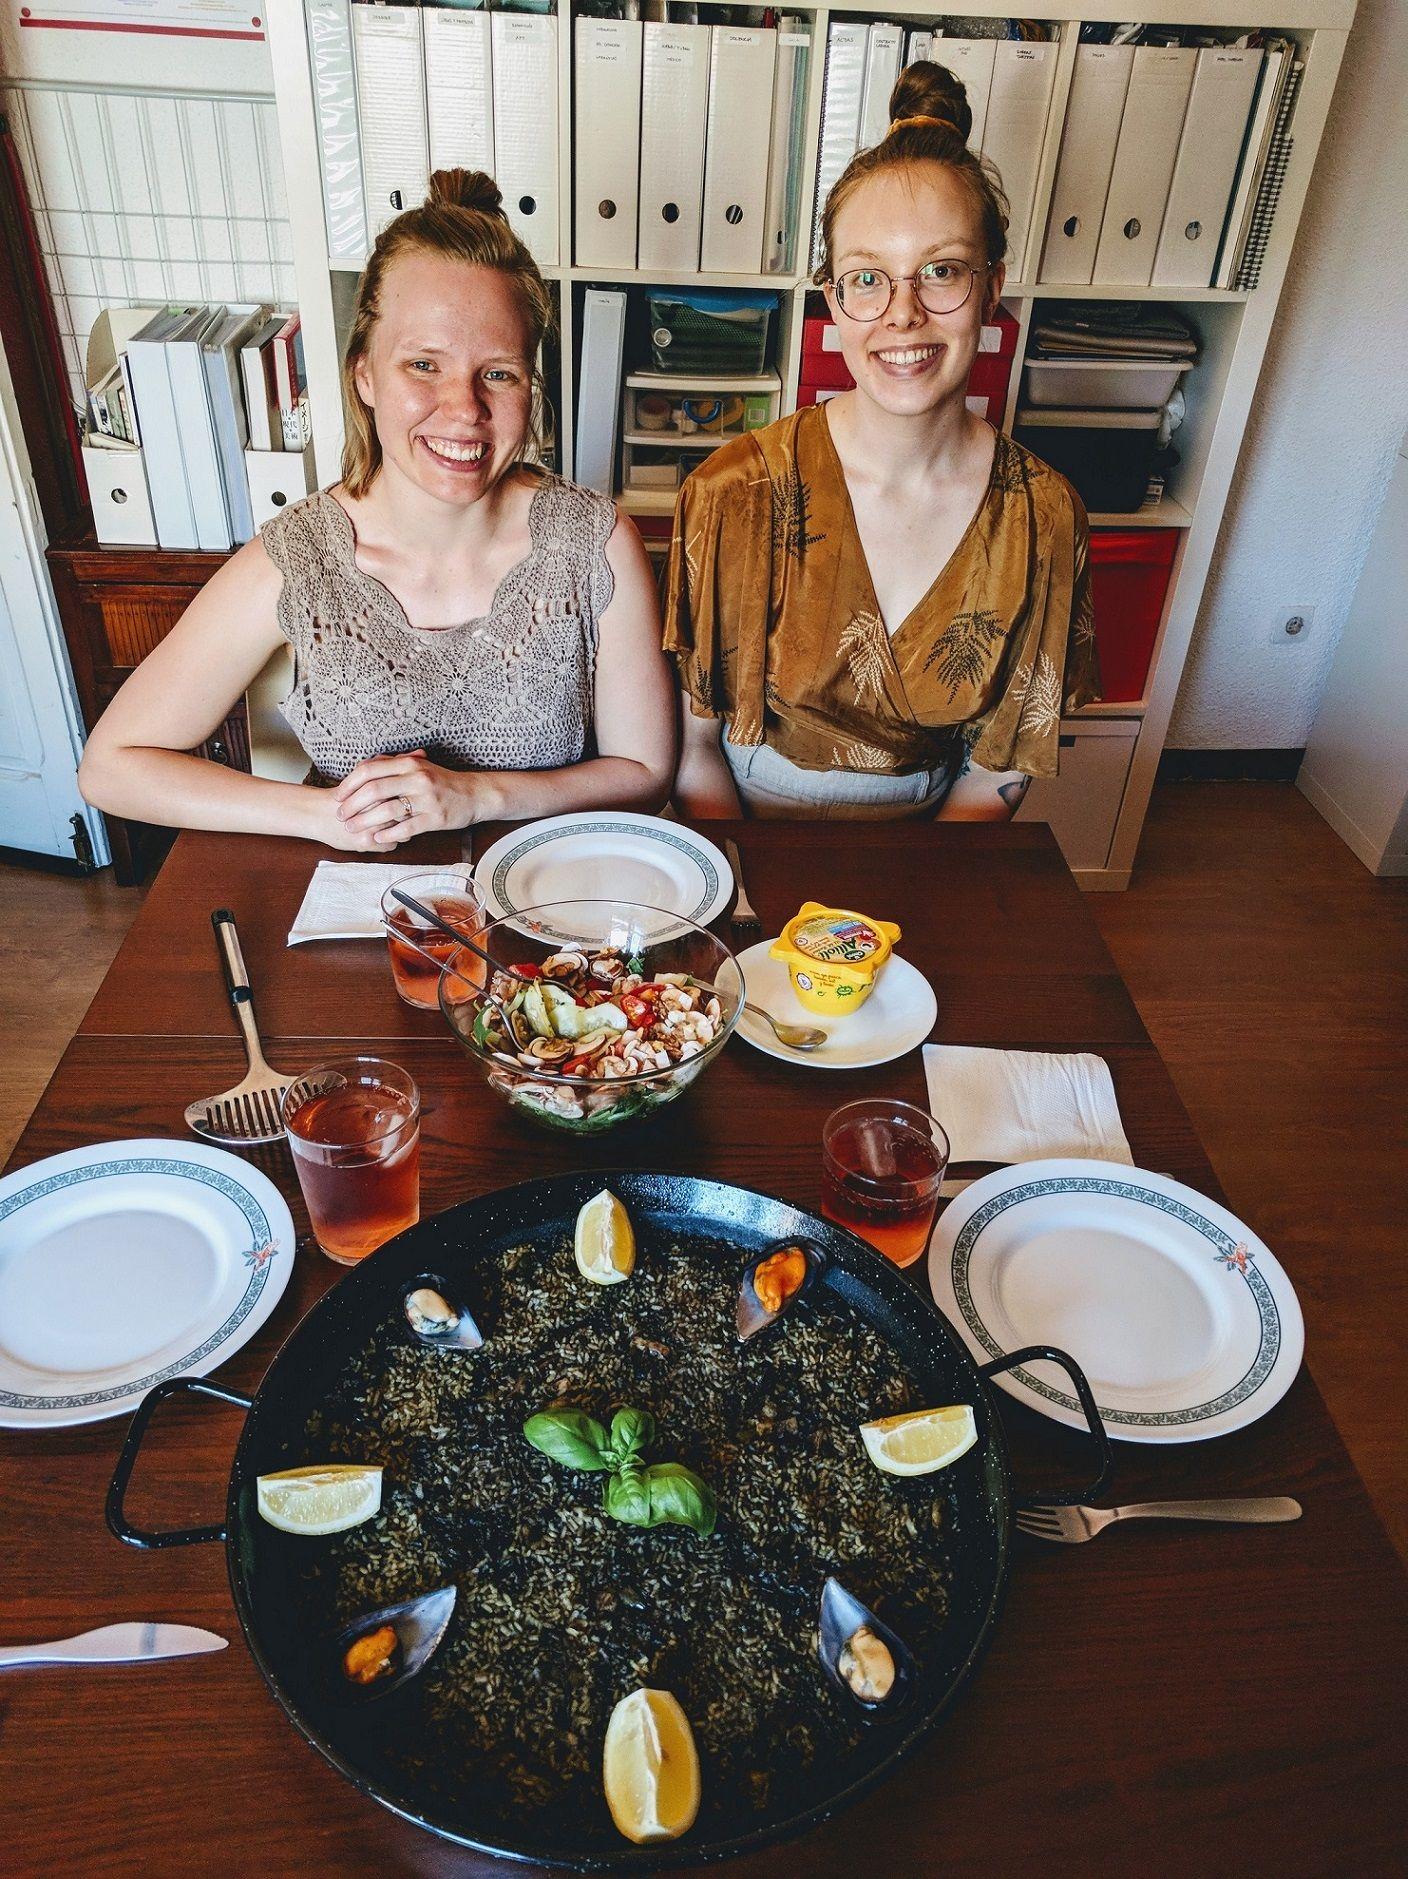 Dos turistas comen paella